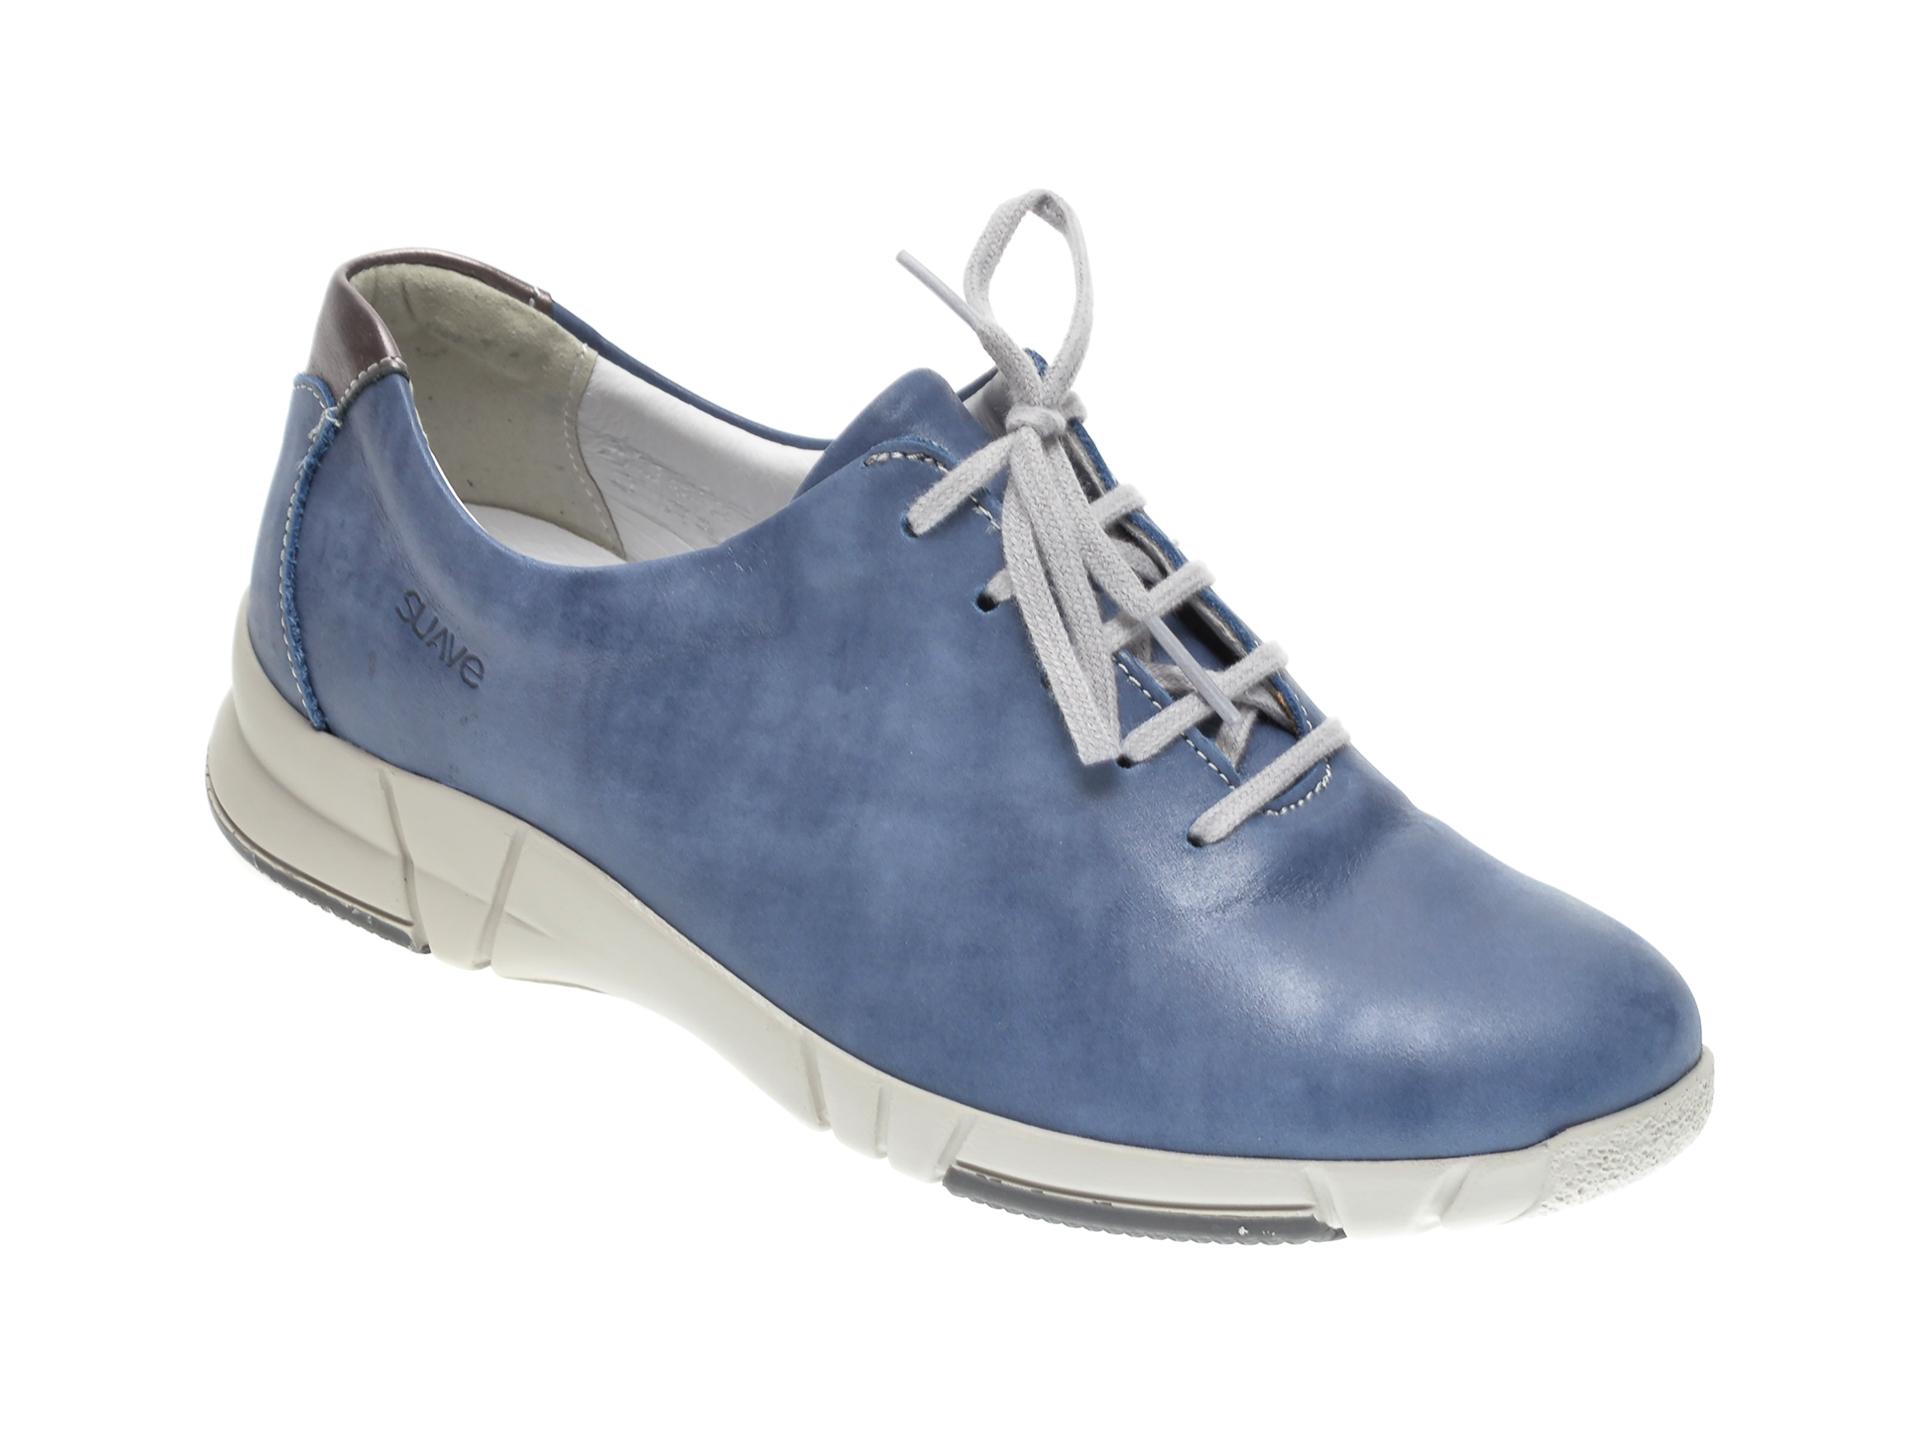 Pantofi SUAVE albastri, 9204, din piele naturala